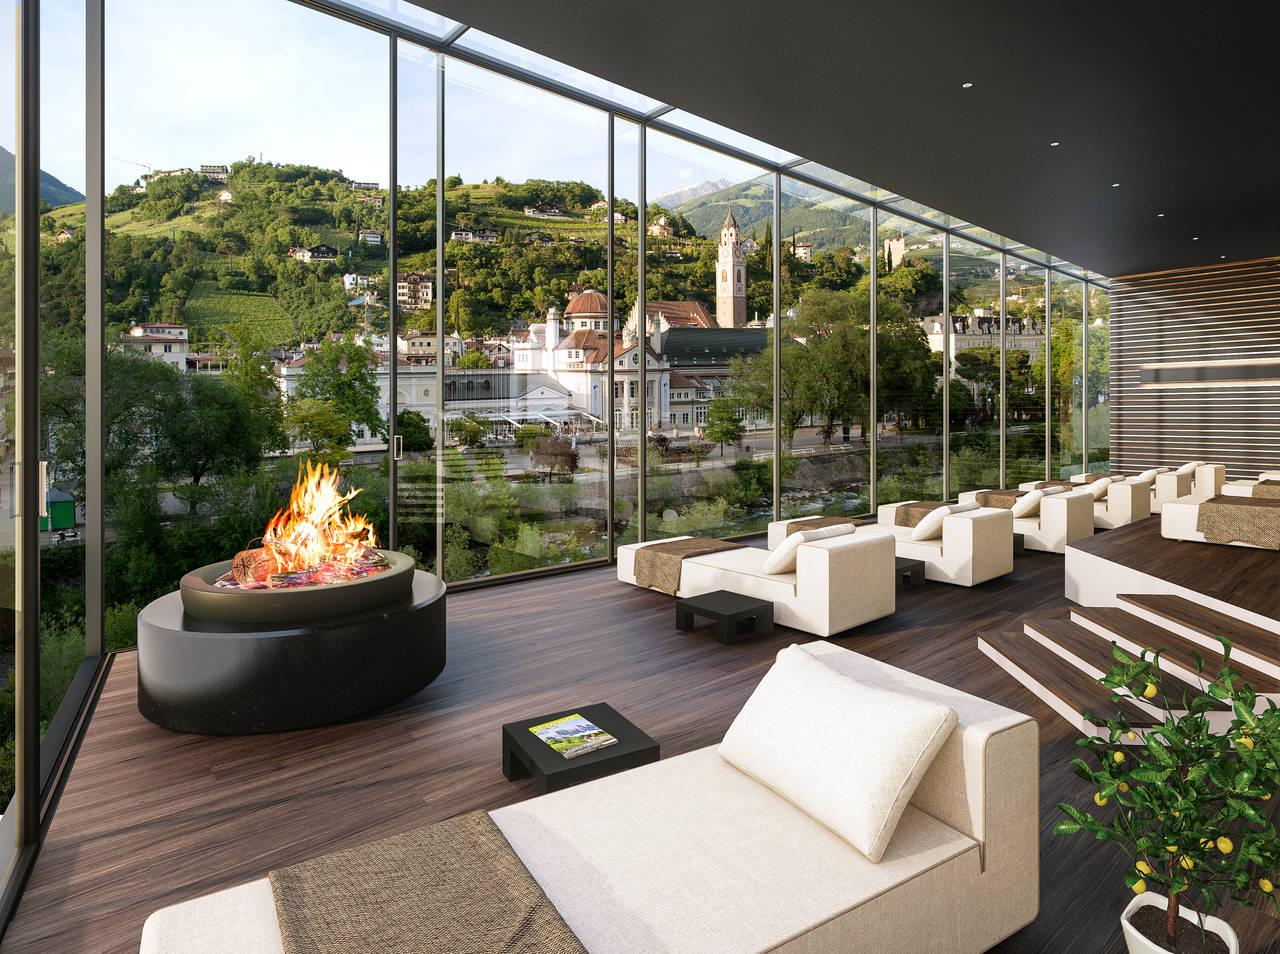 SKY SPA Hotel Terme Merano Relax